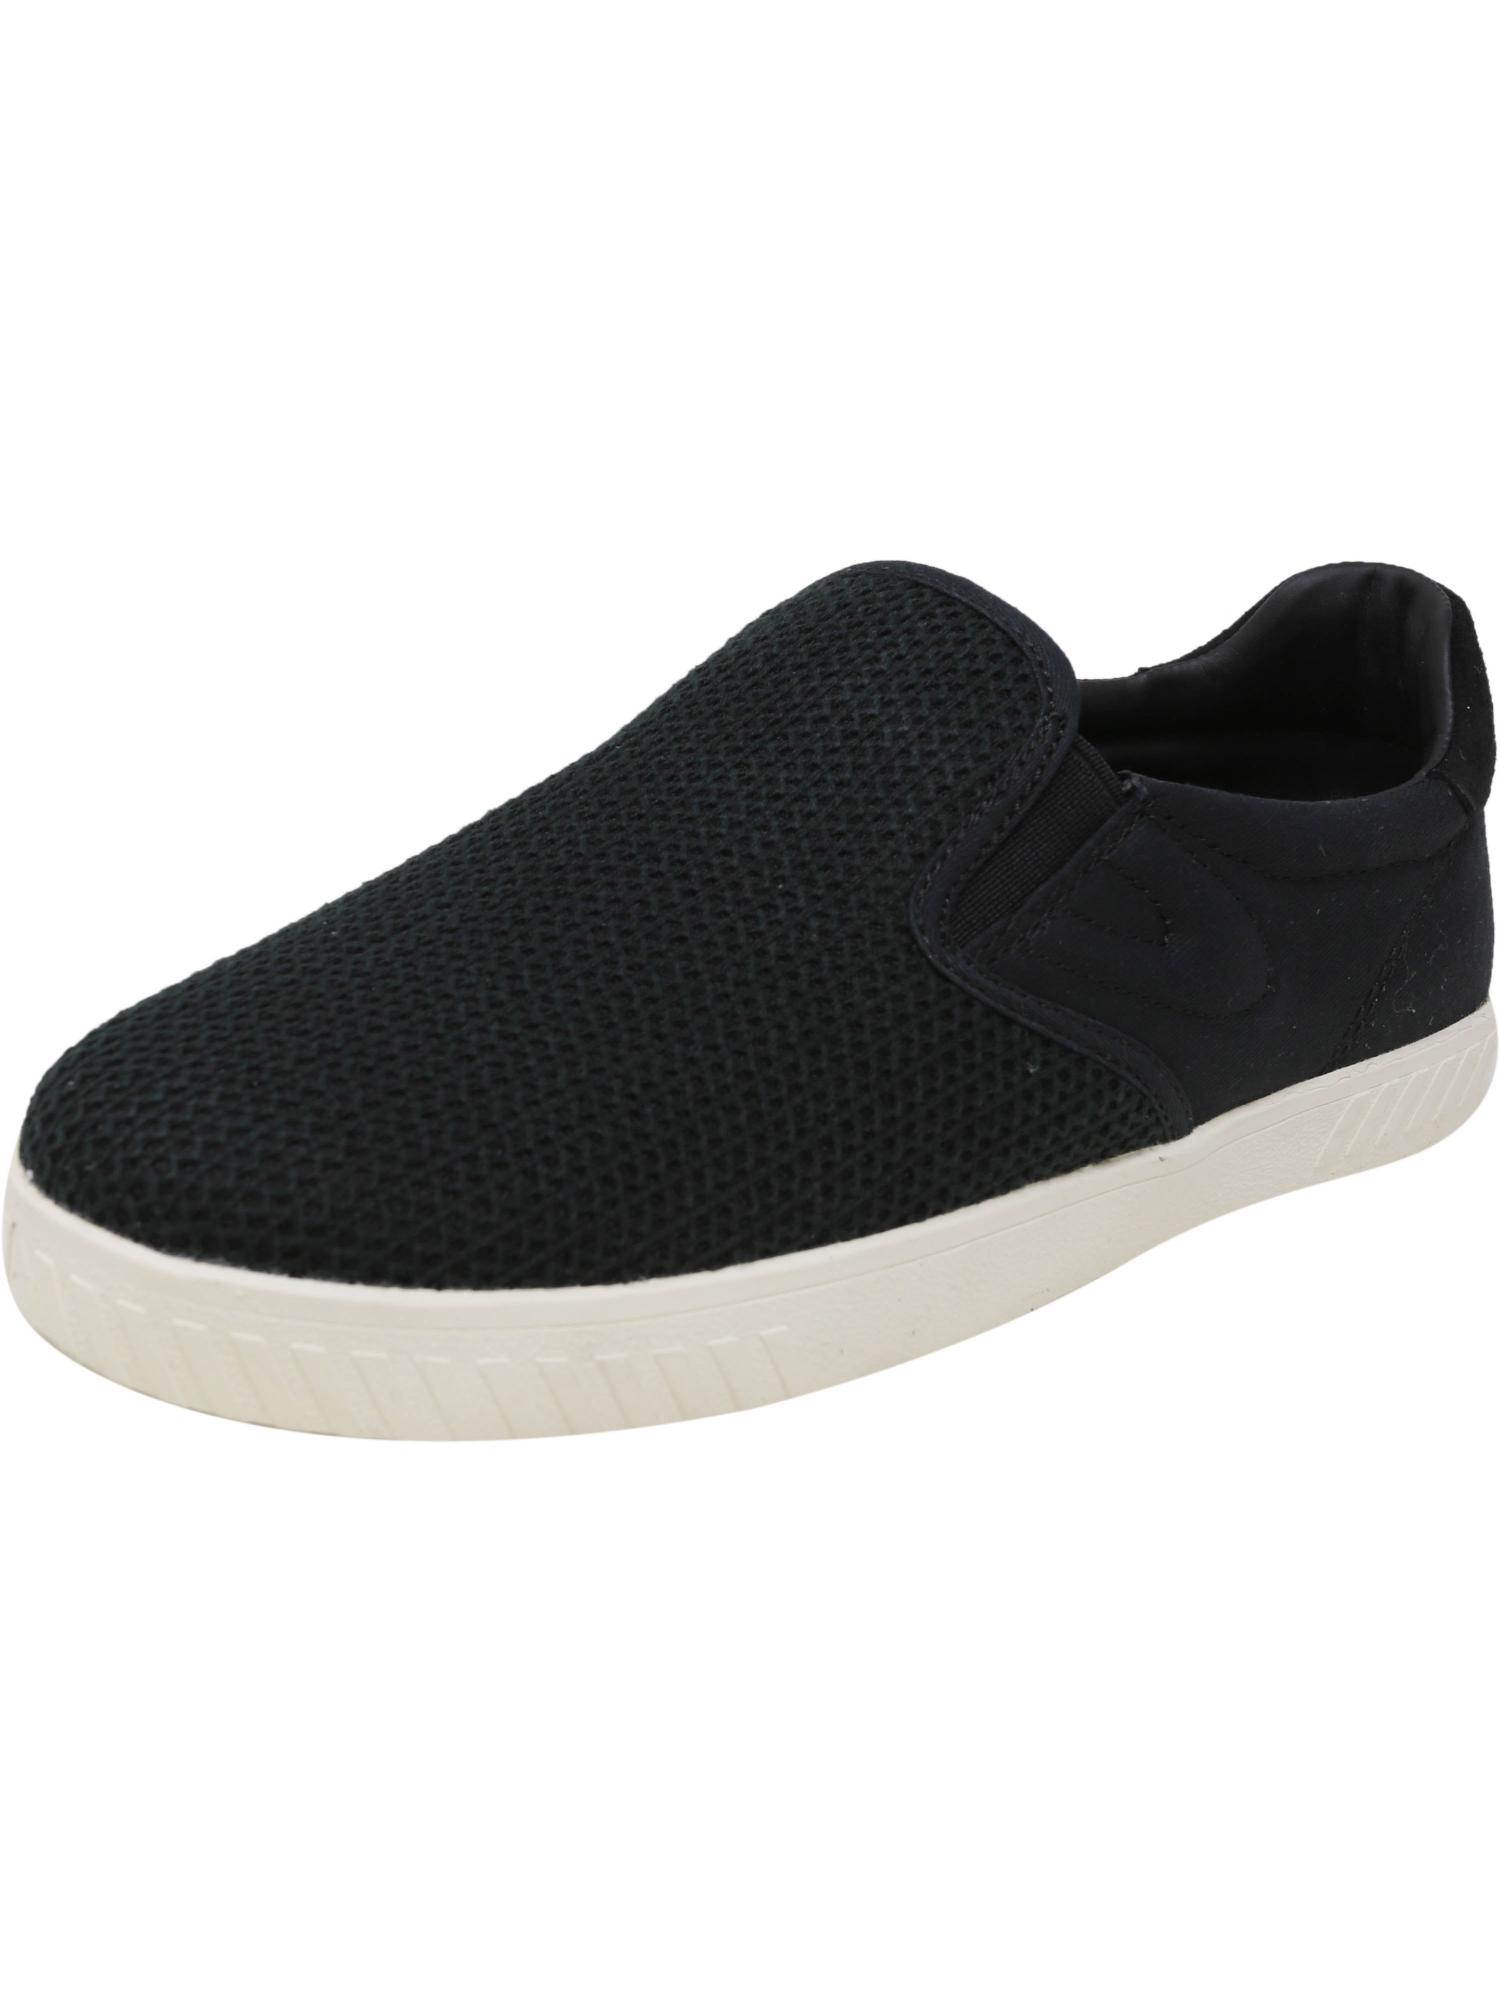 Tretorn-Femmes-Cruz-tissu-aux-chevilles-Haute-Slip-Chaussures-en miniature 8